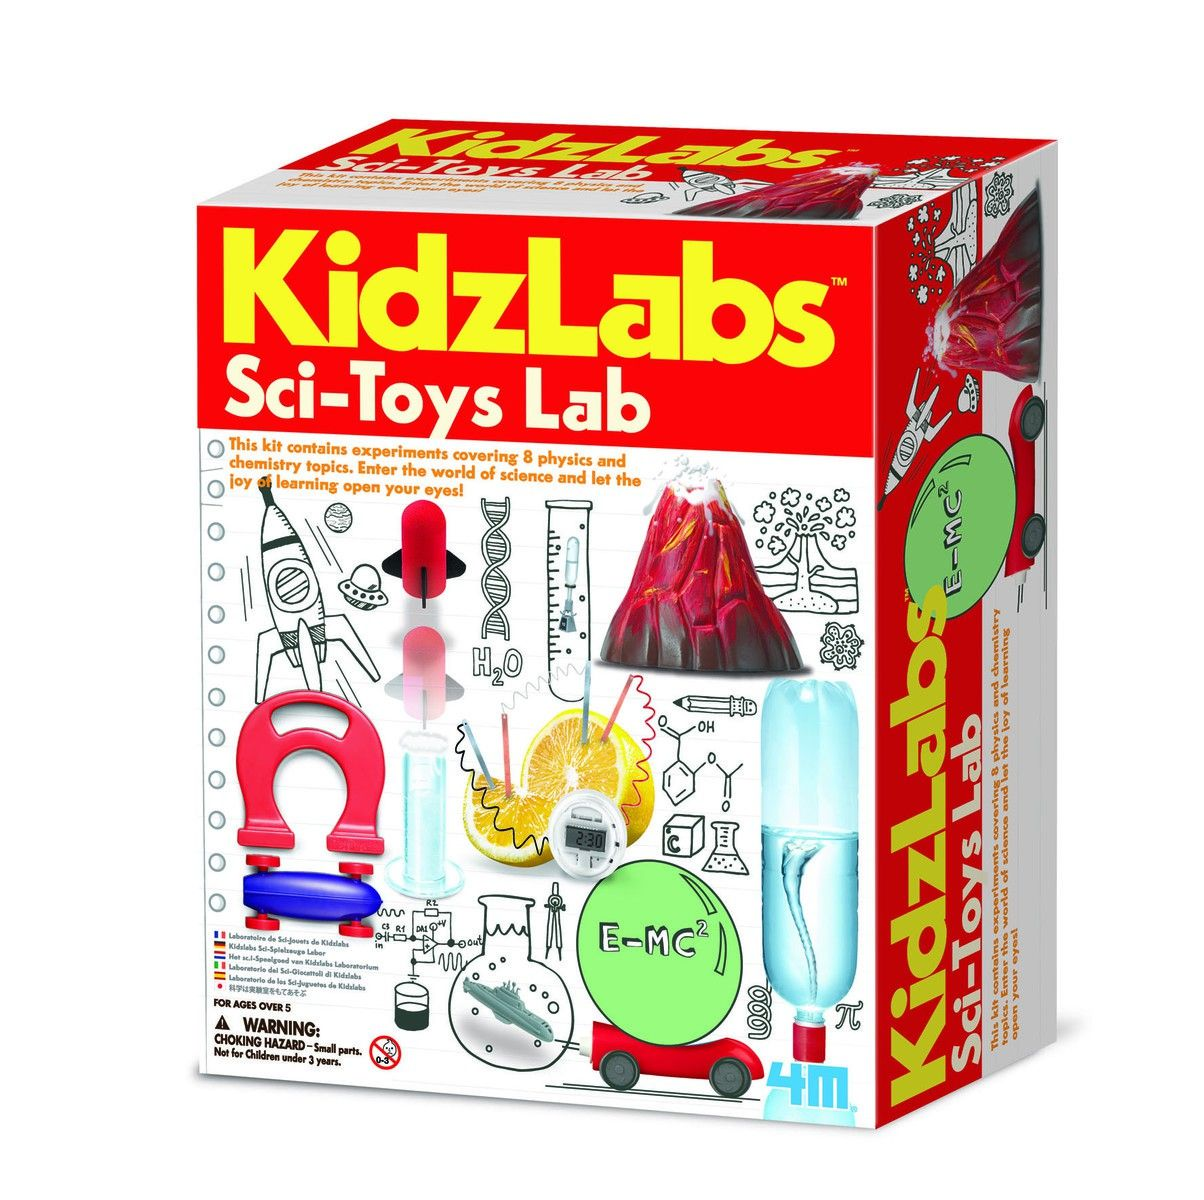 Kidzlabs+combopack+sci-toys+lab+5++-+